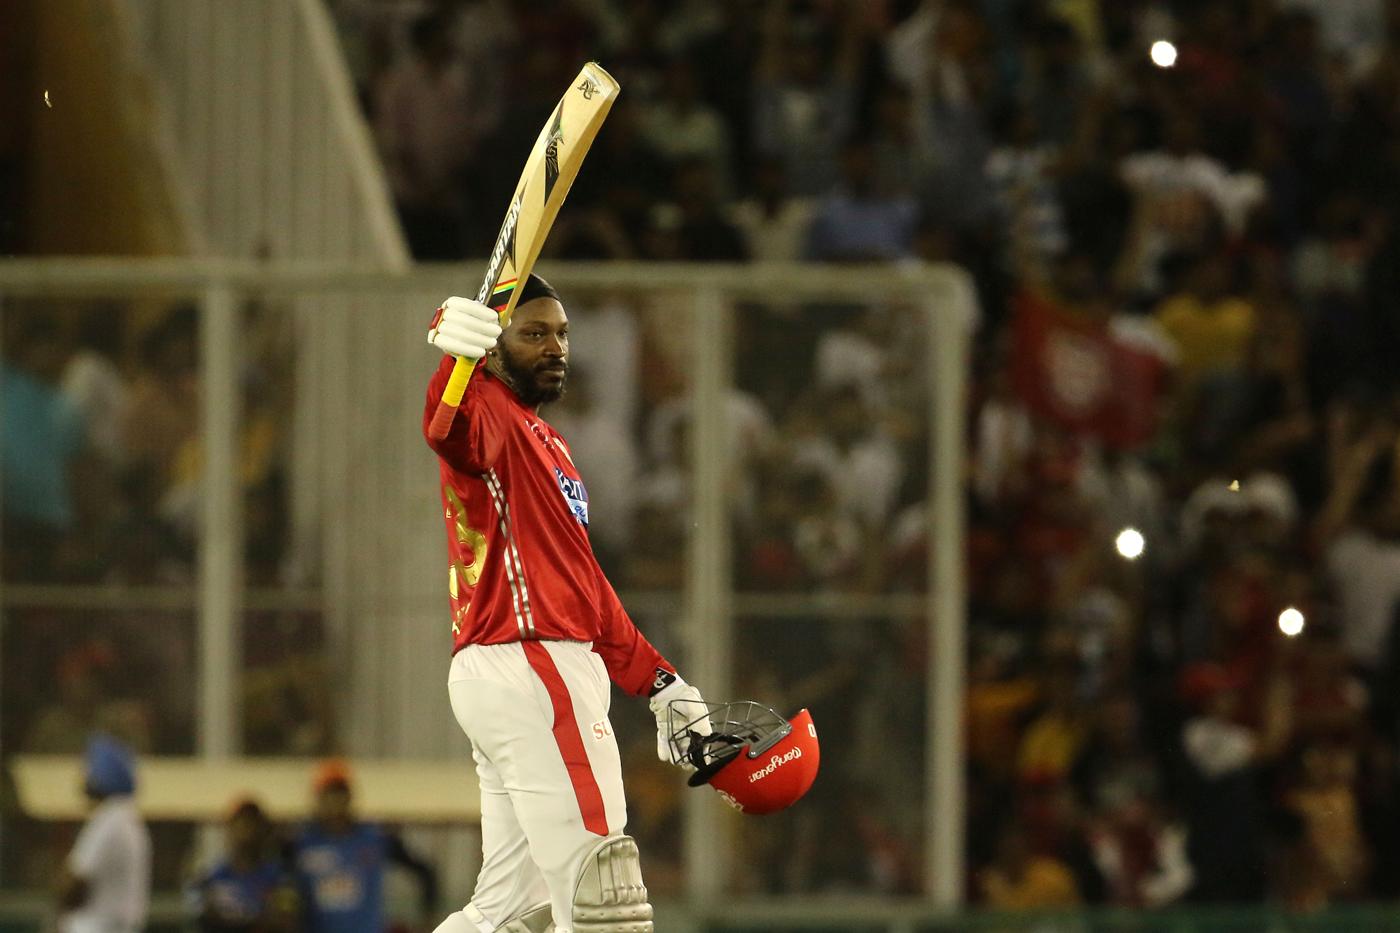 IPL 2018: Chris Gayle Dedicates his Knock to His Daughter